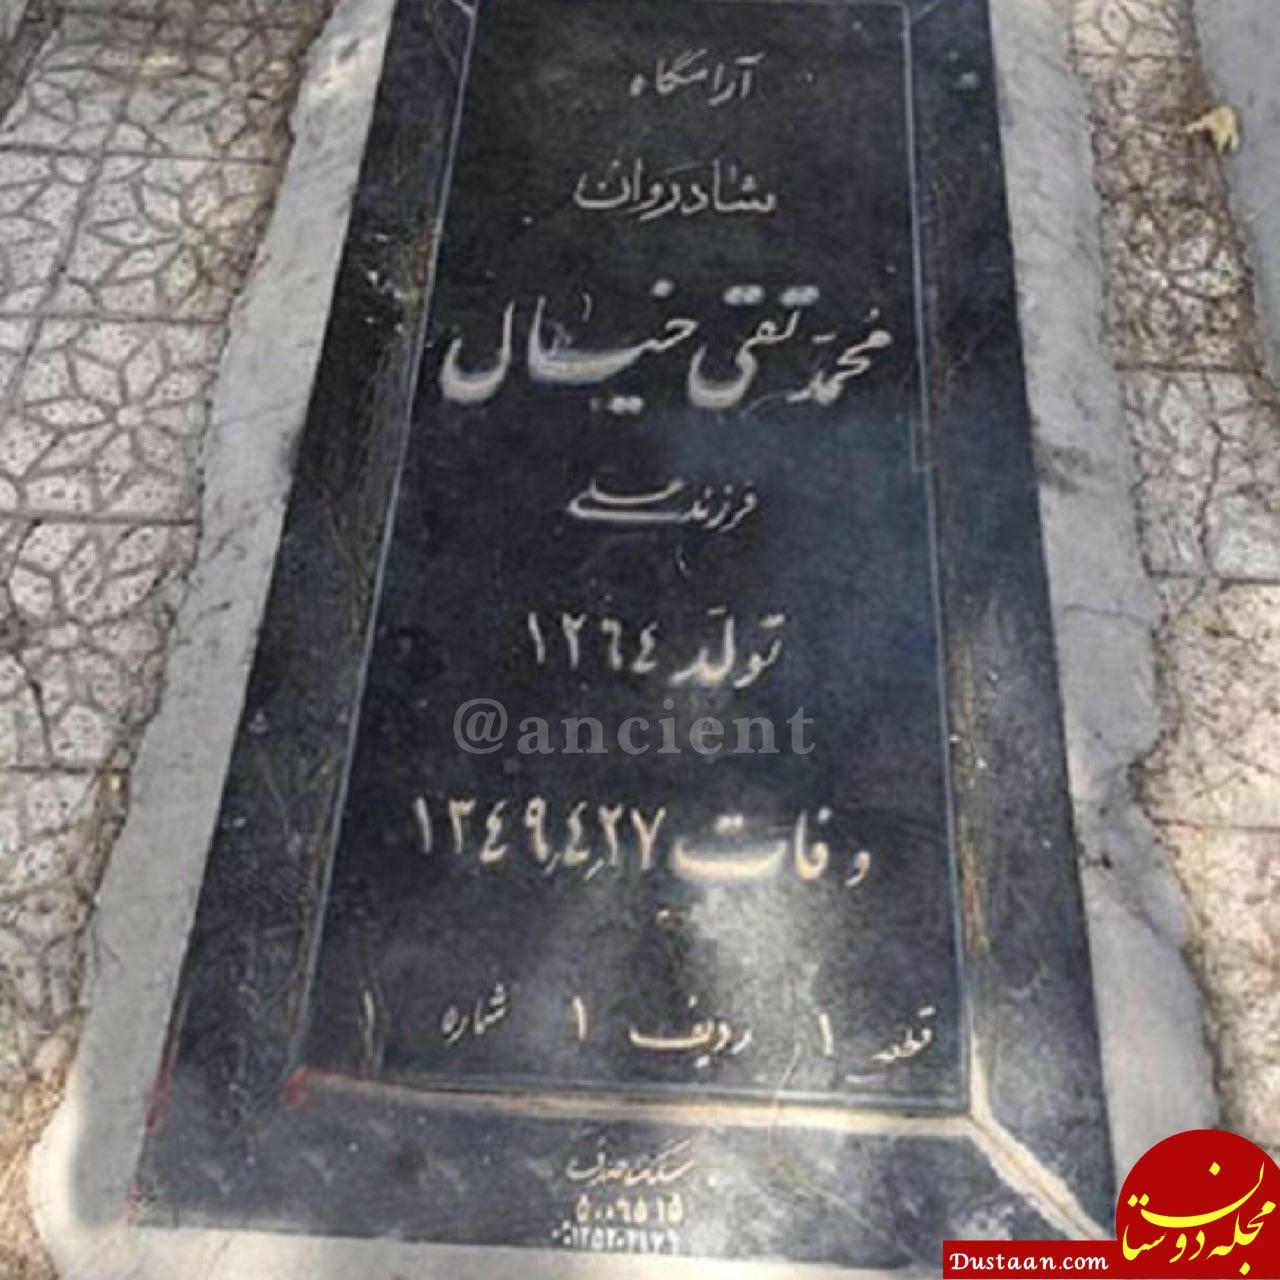 www.dustaan.com اولین قبر در بهشت زهرا +عکس